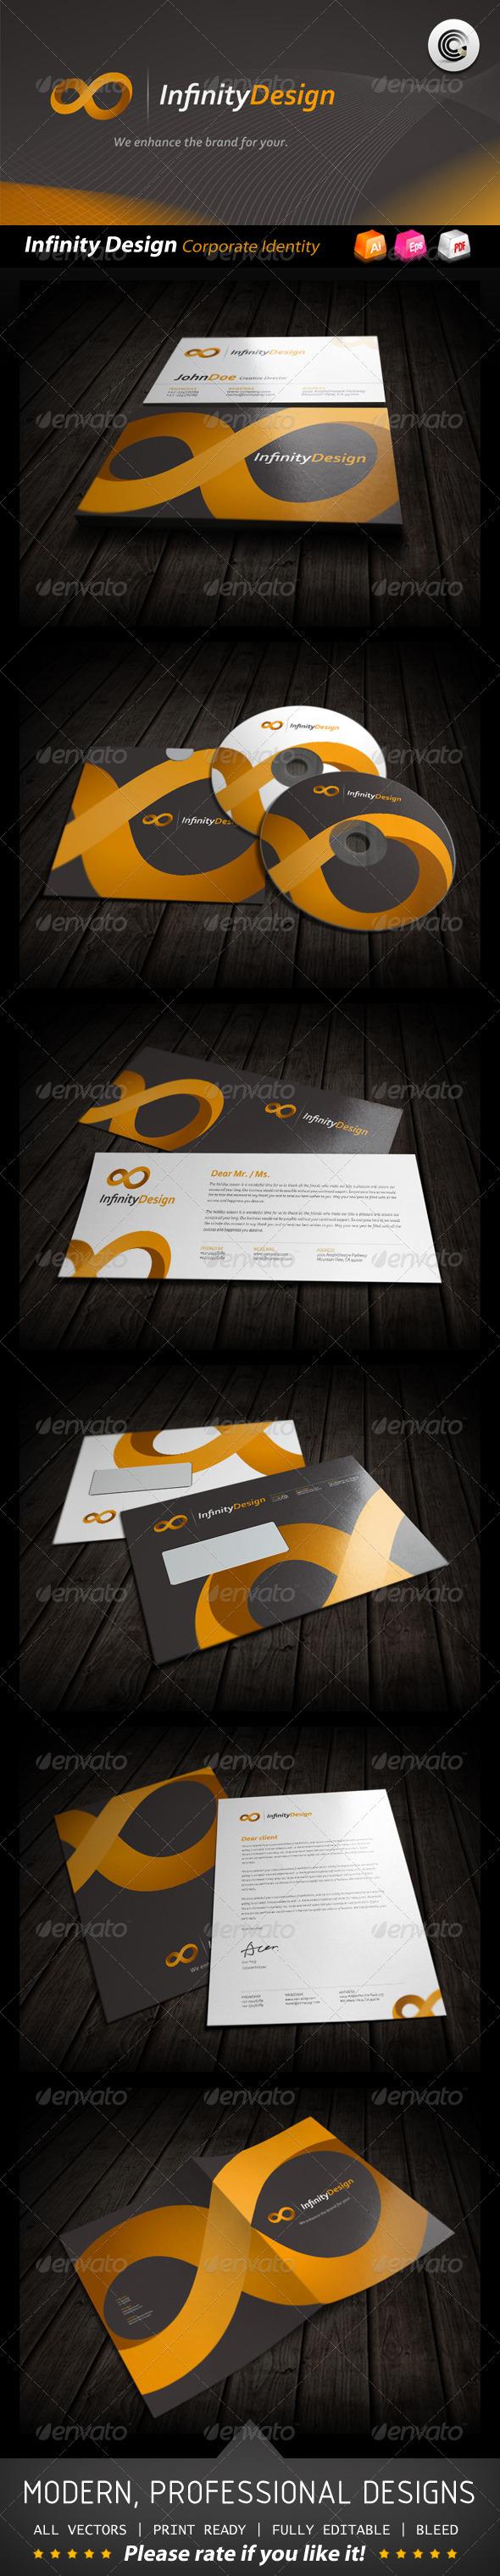 Infinity Design Corporate Identity - Stationery Print Templates